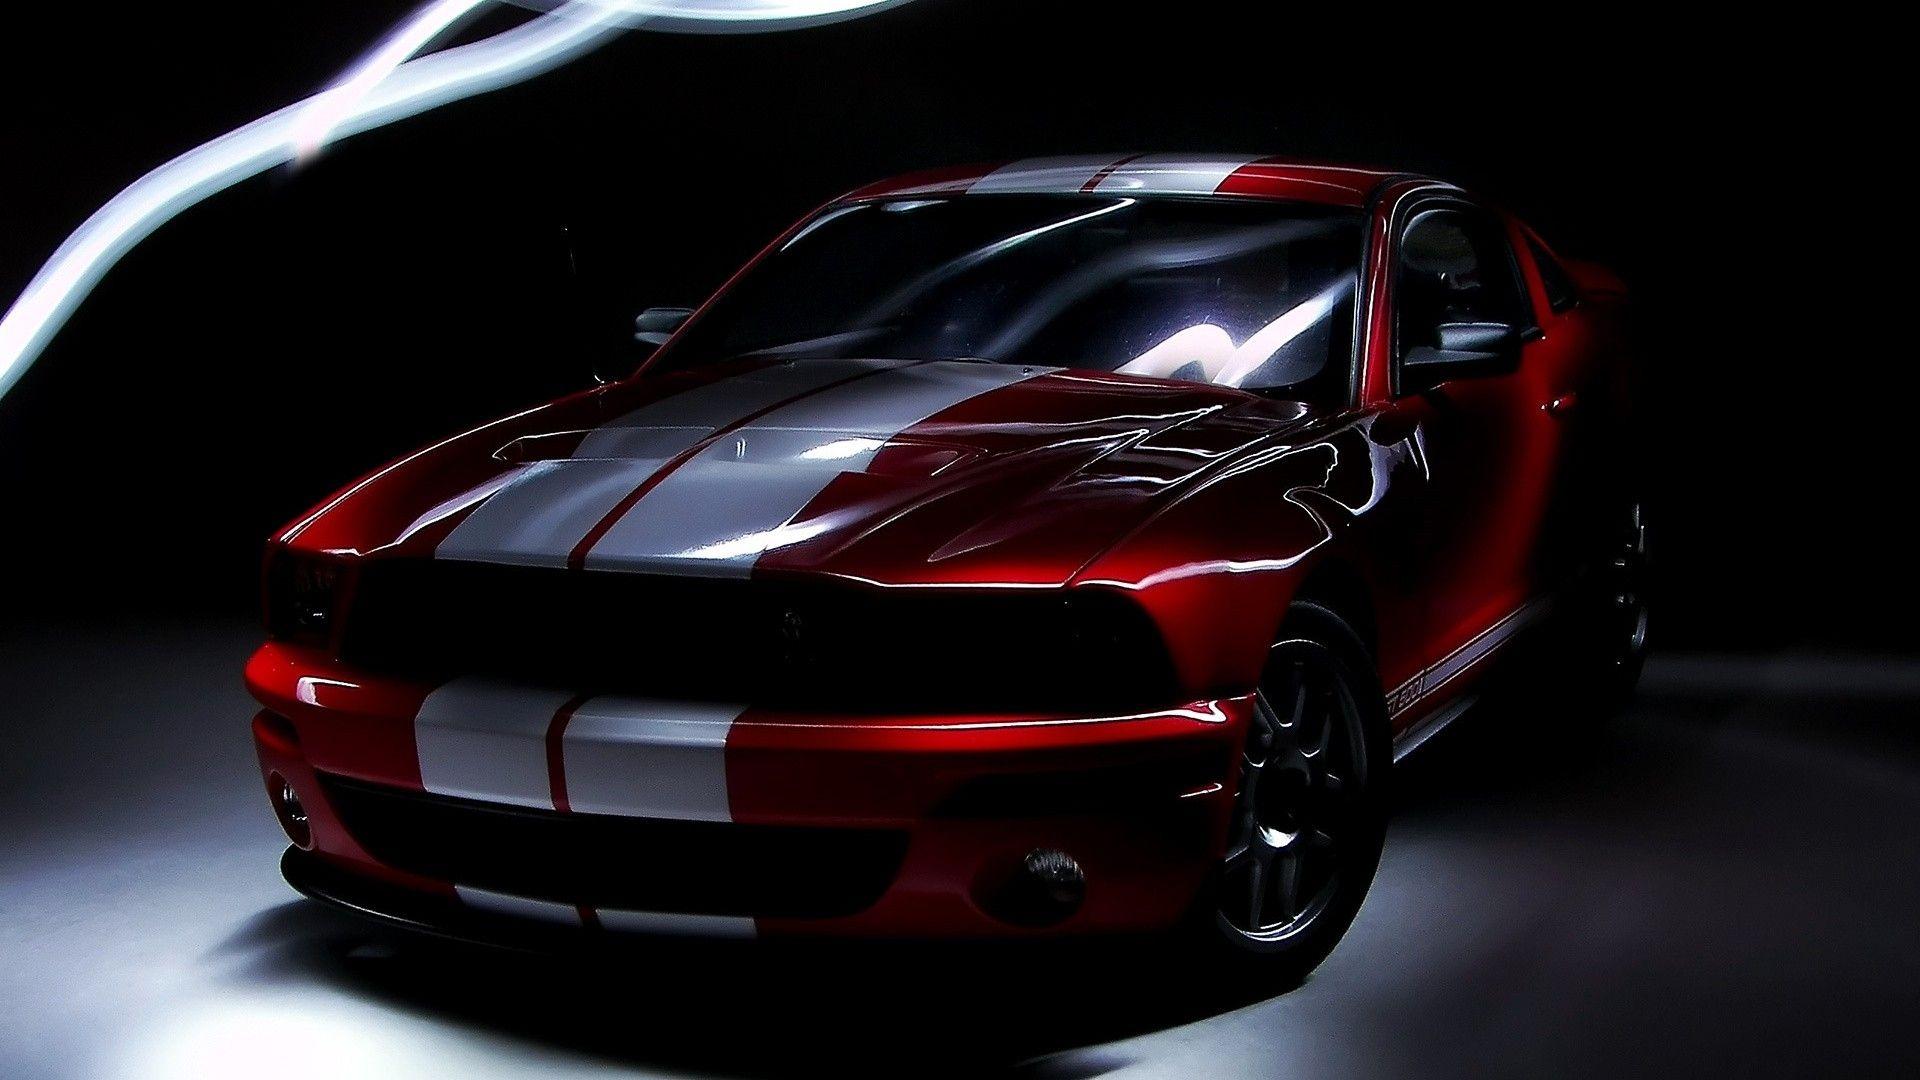 2013 Ford Mustang GT Wallpaper is hd wallpaper for desktop